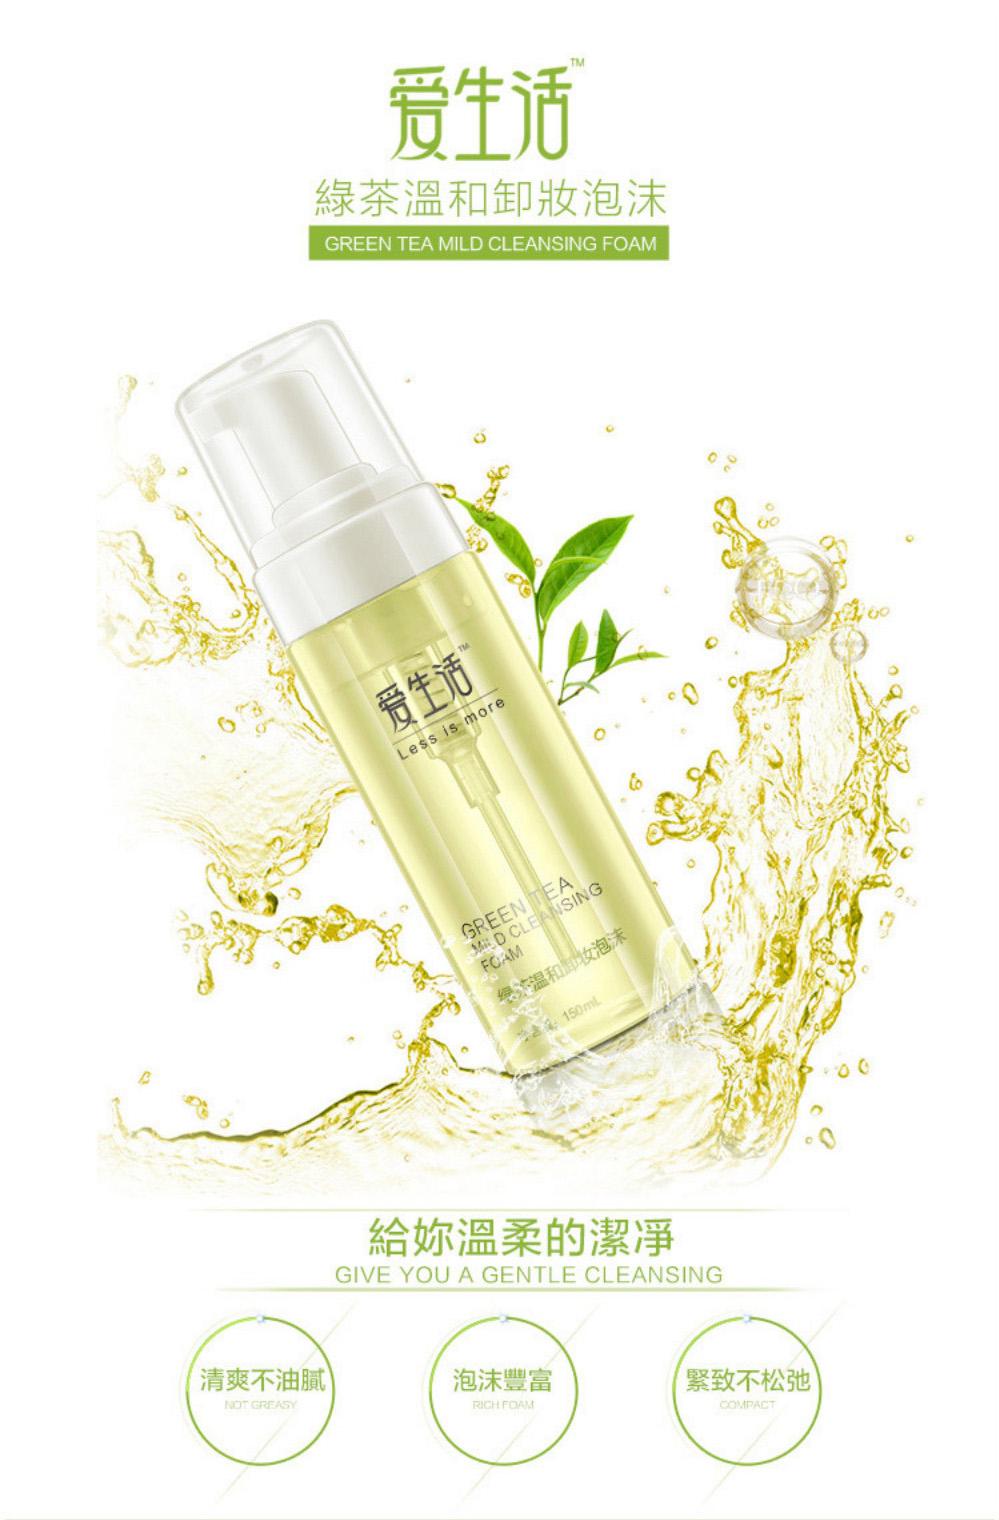 150ml_Green_Tea_Mild_Cleansing_Foam_Page_01_Image_0001